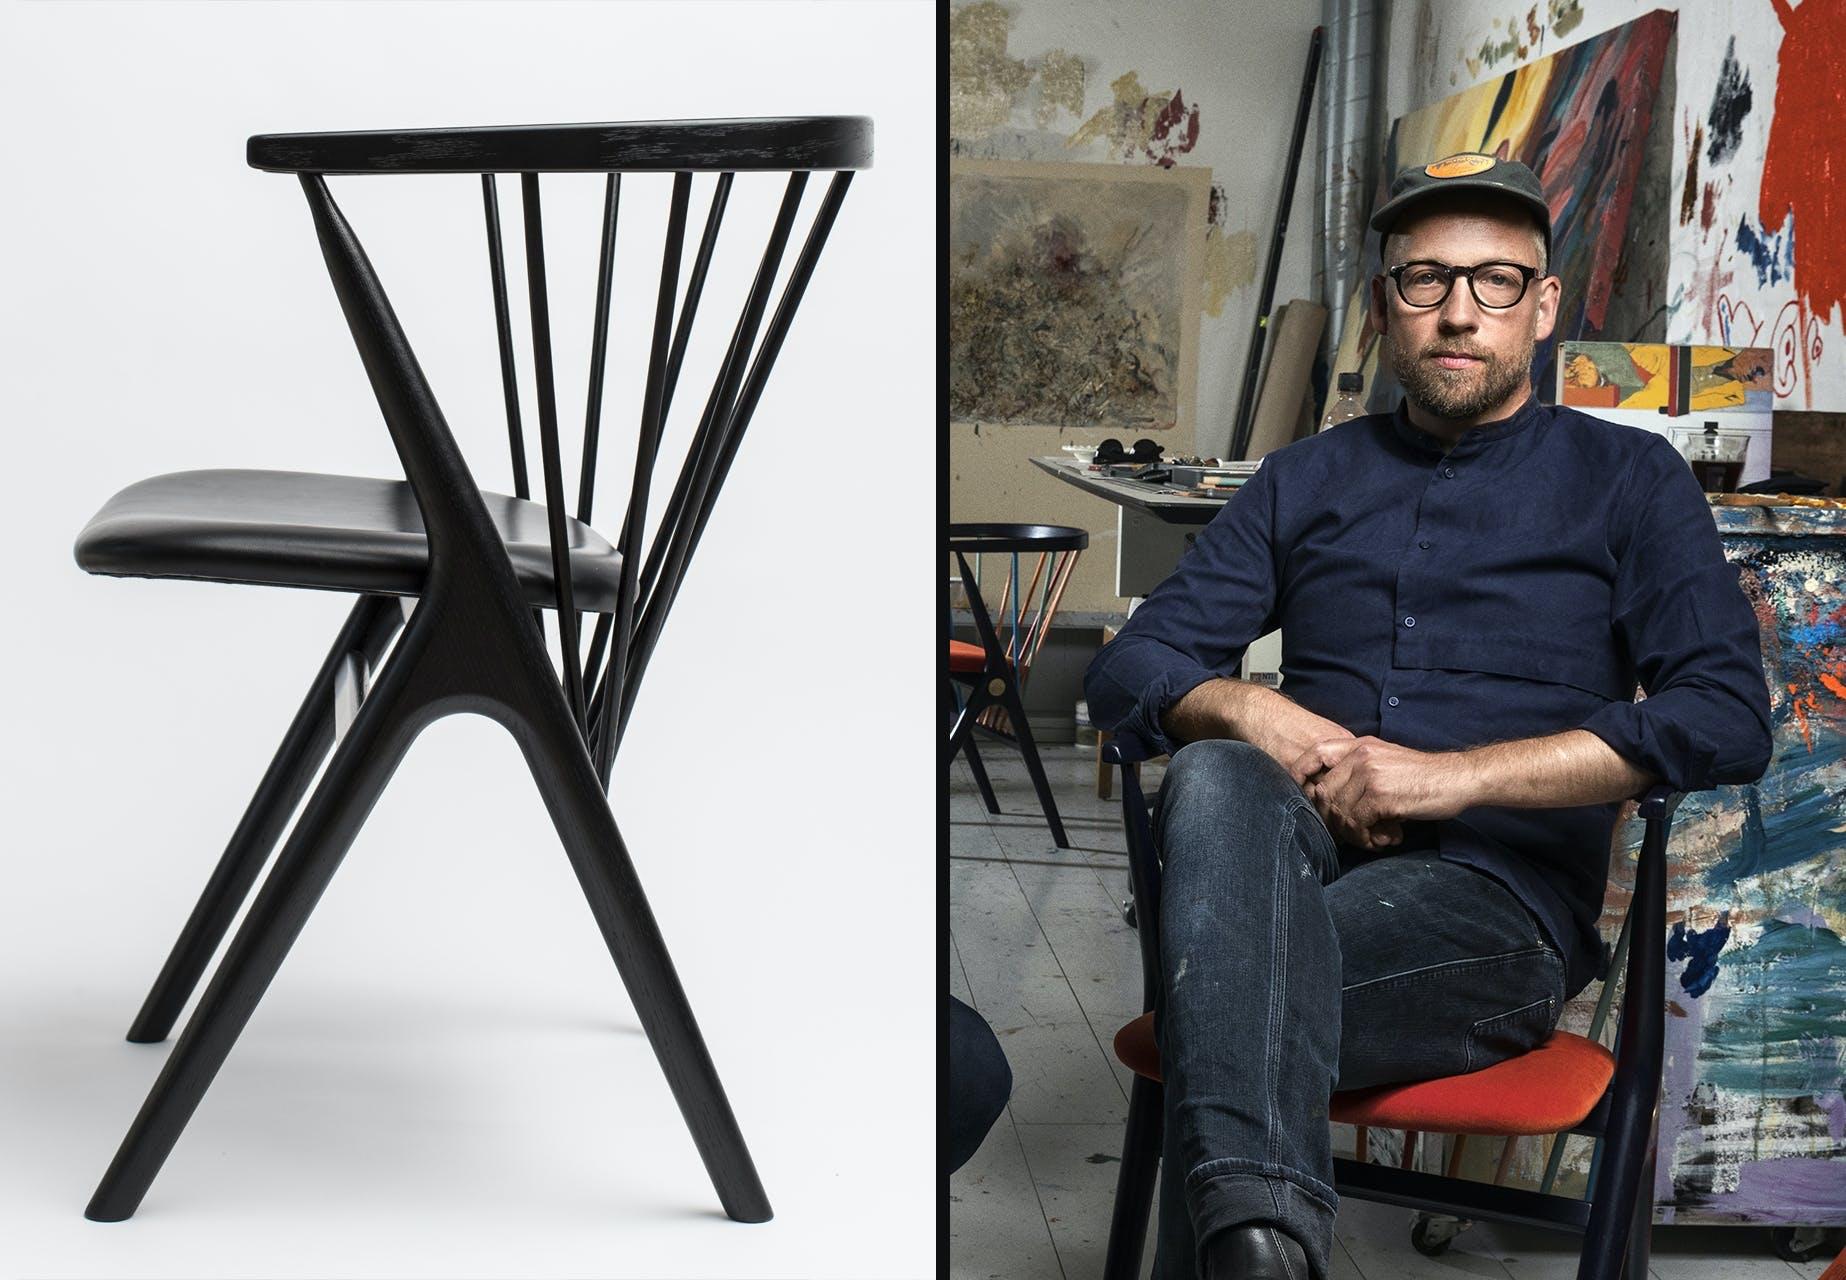 kashmir sibast stol danske design